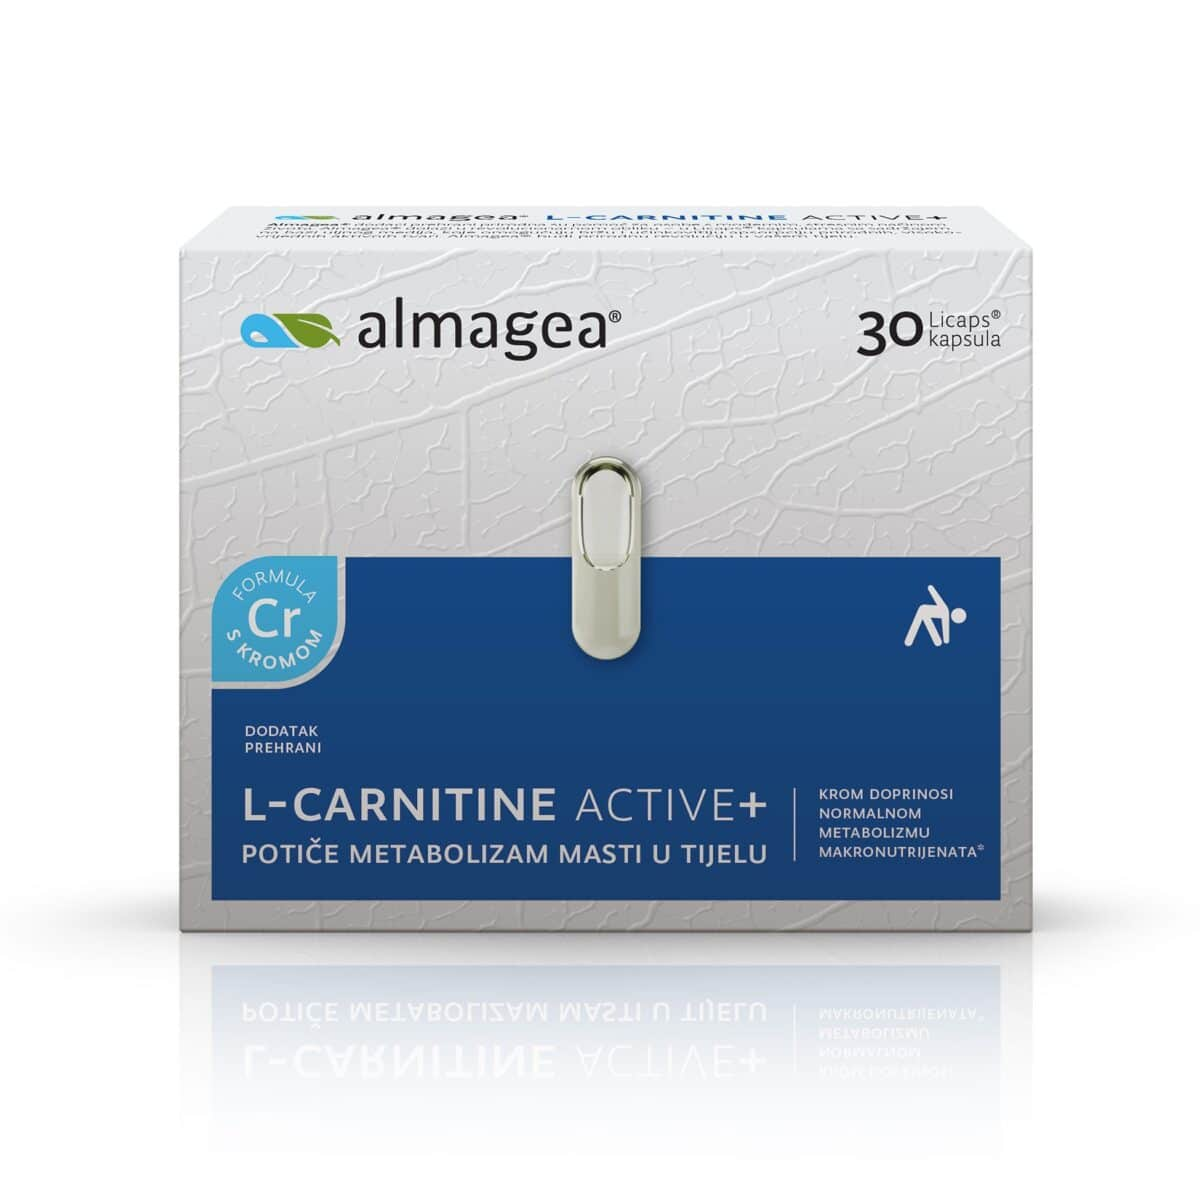 AlmageaL-CARNITINEACTIVE+ (30 kapsula)AlmageaL-CARNITINEACTIVE+ (30 kapsula)